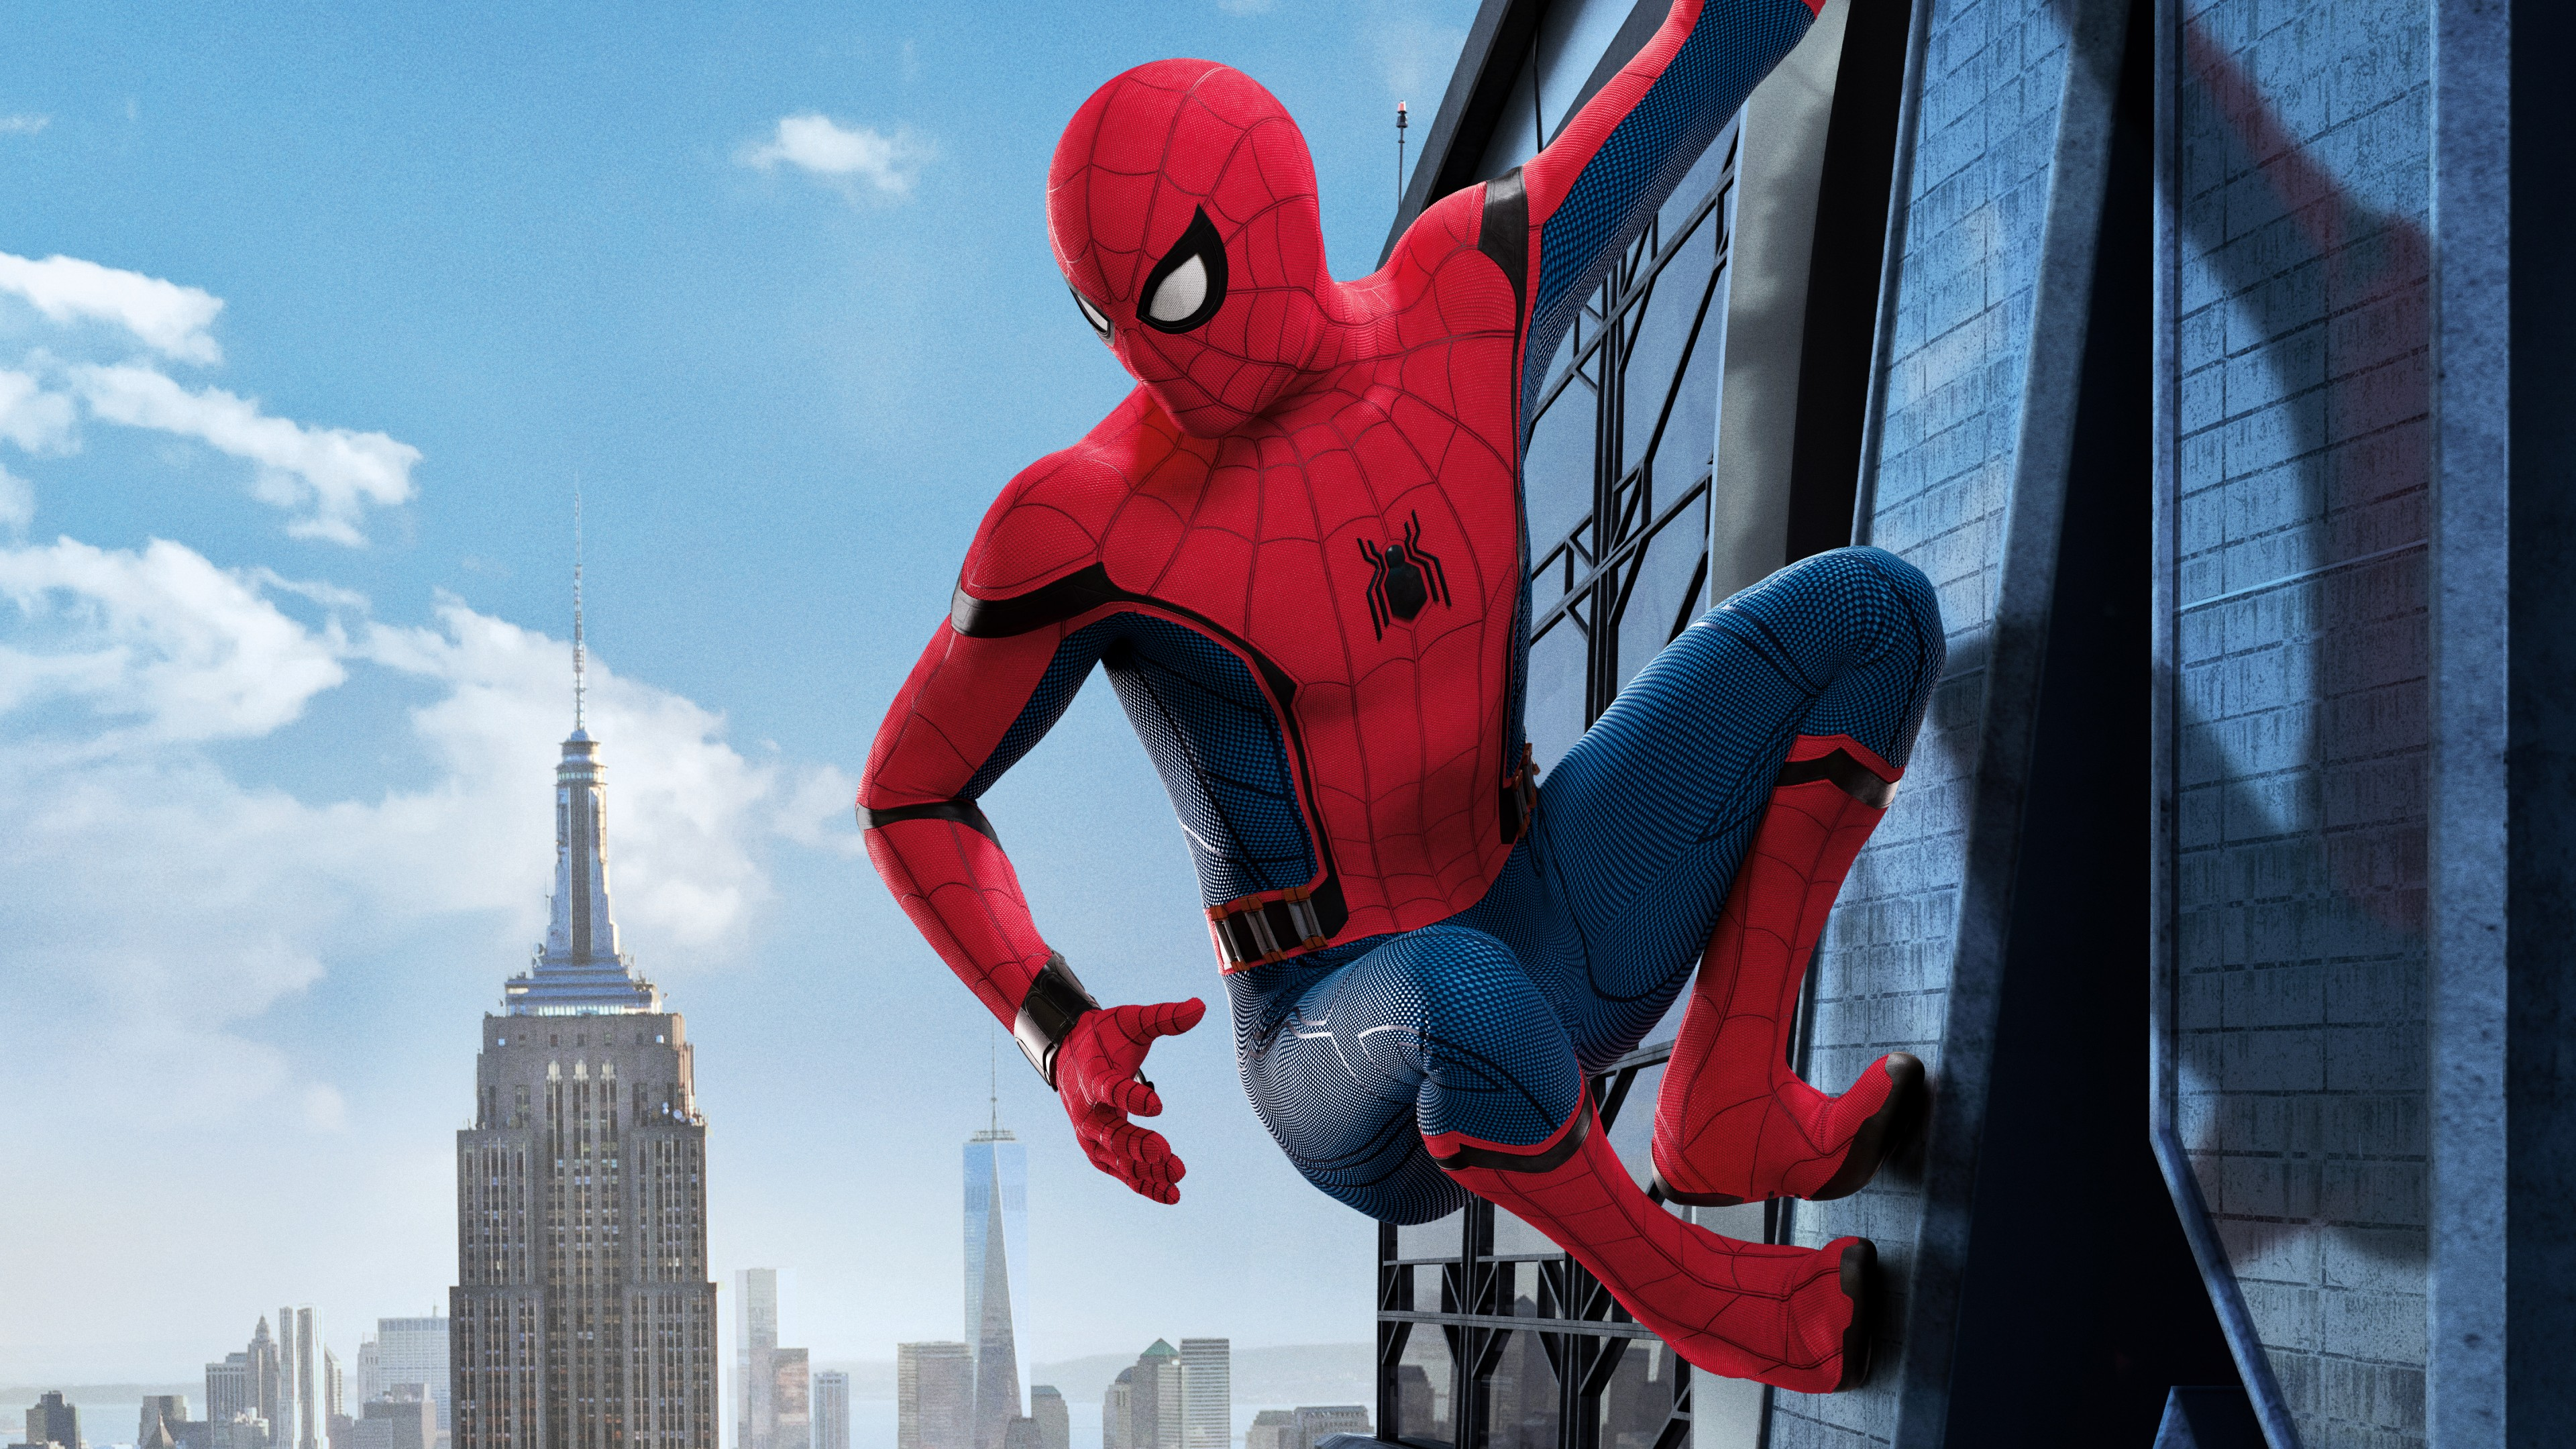 spider-man-homecoming-4k-wallpaper-3